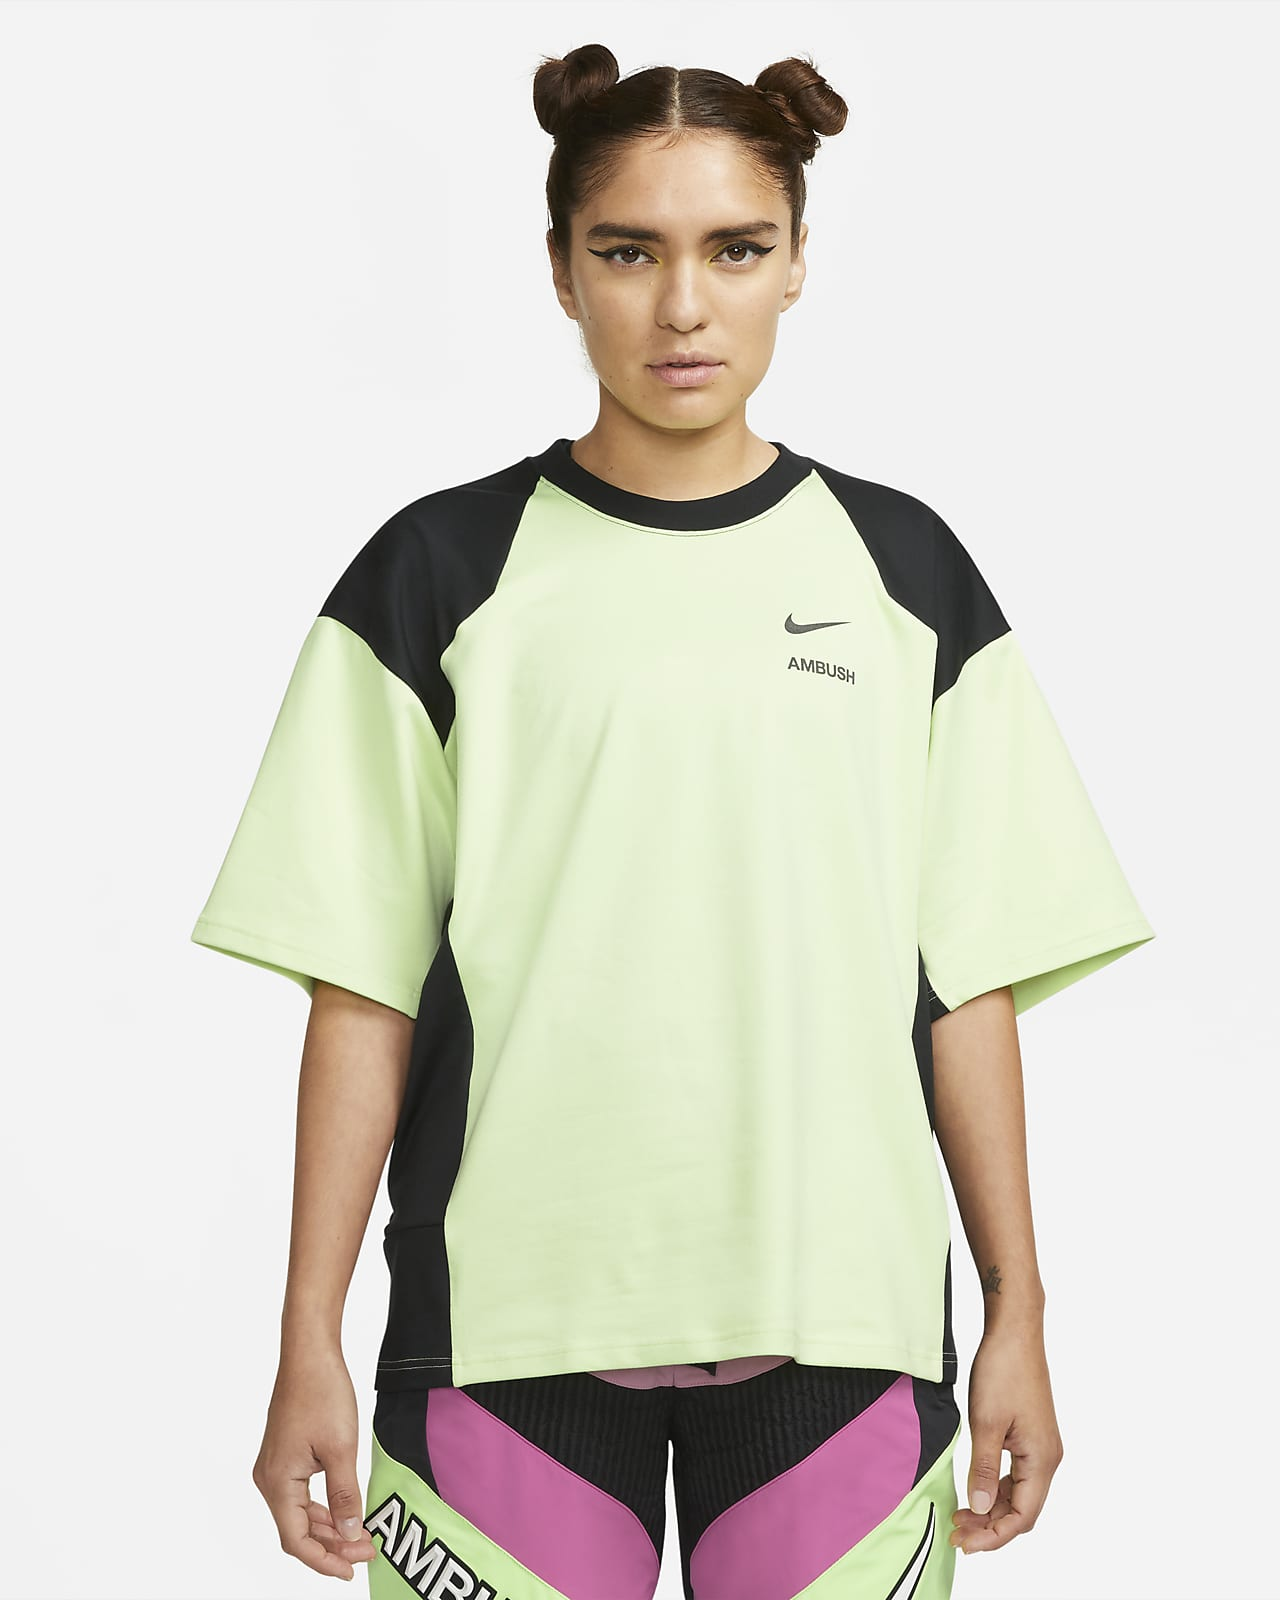 Nike x AMBUSH 男/女短袖T恤